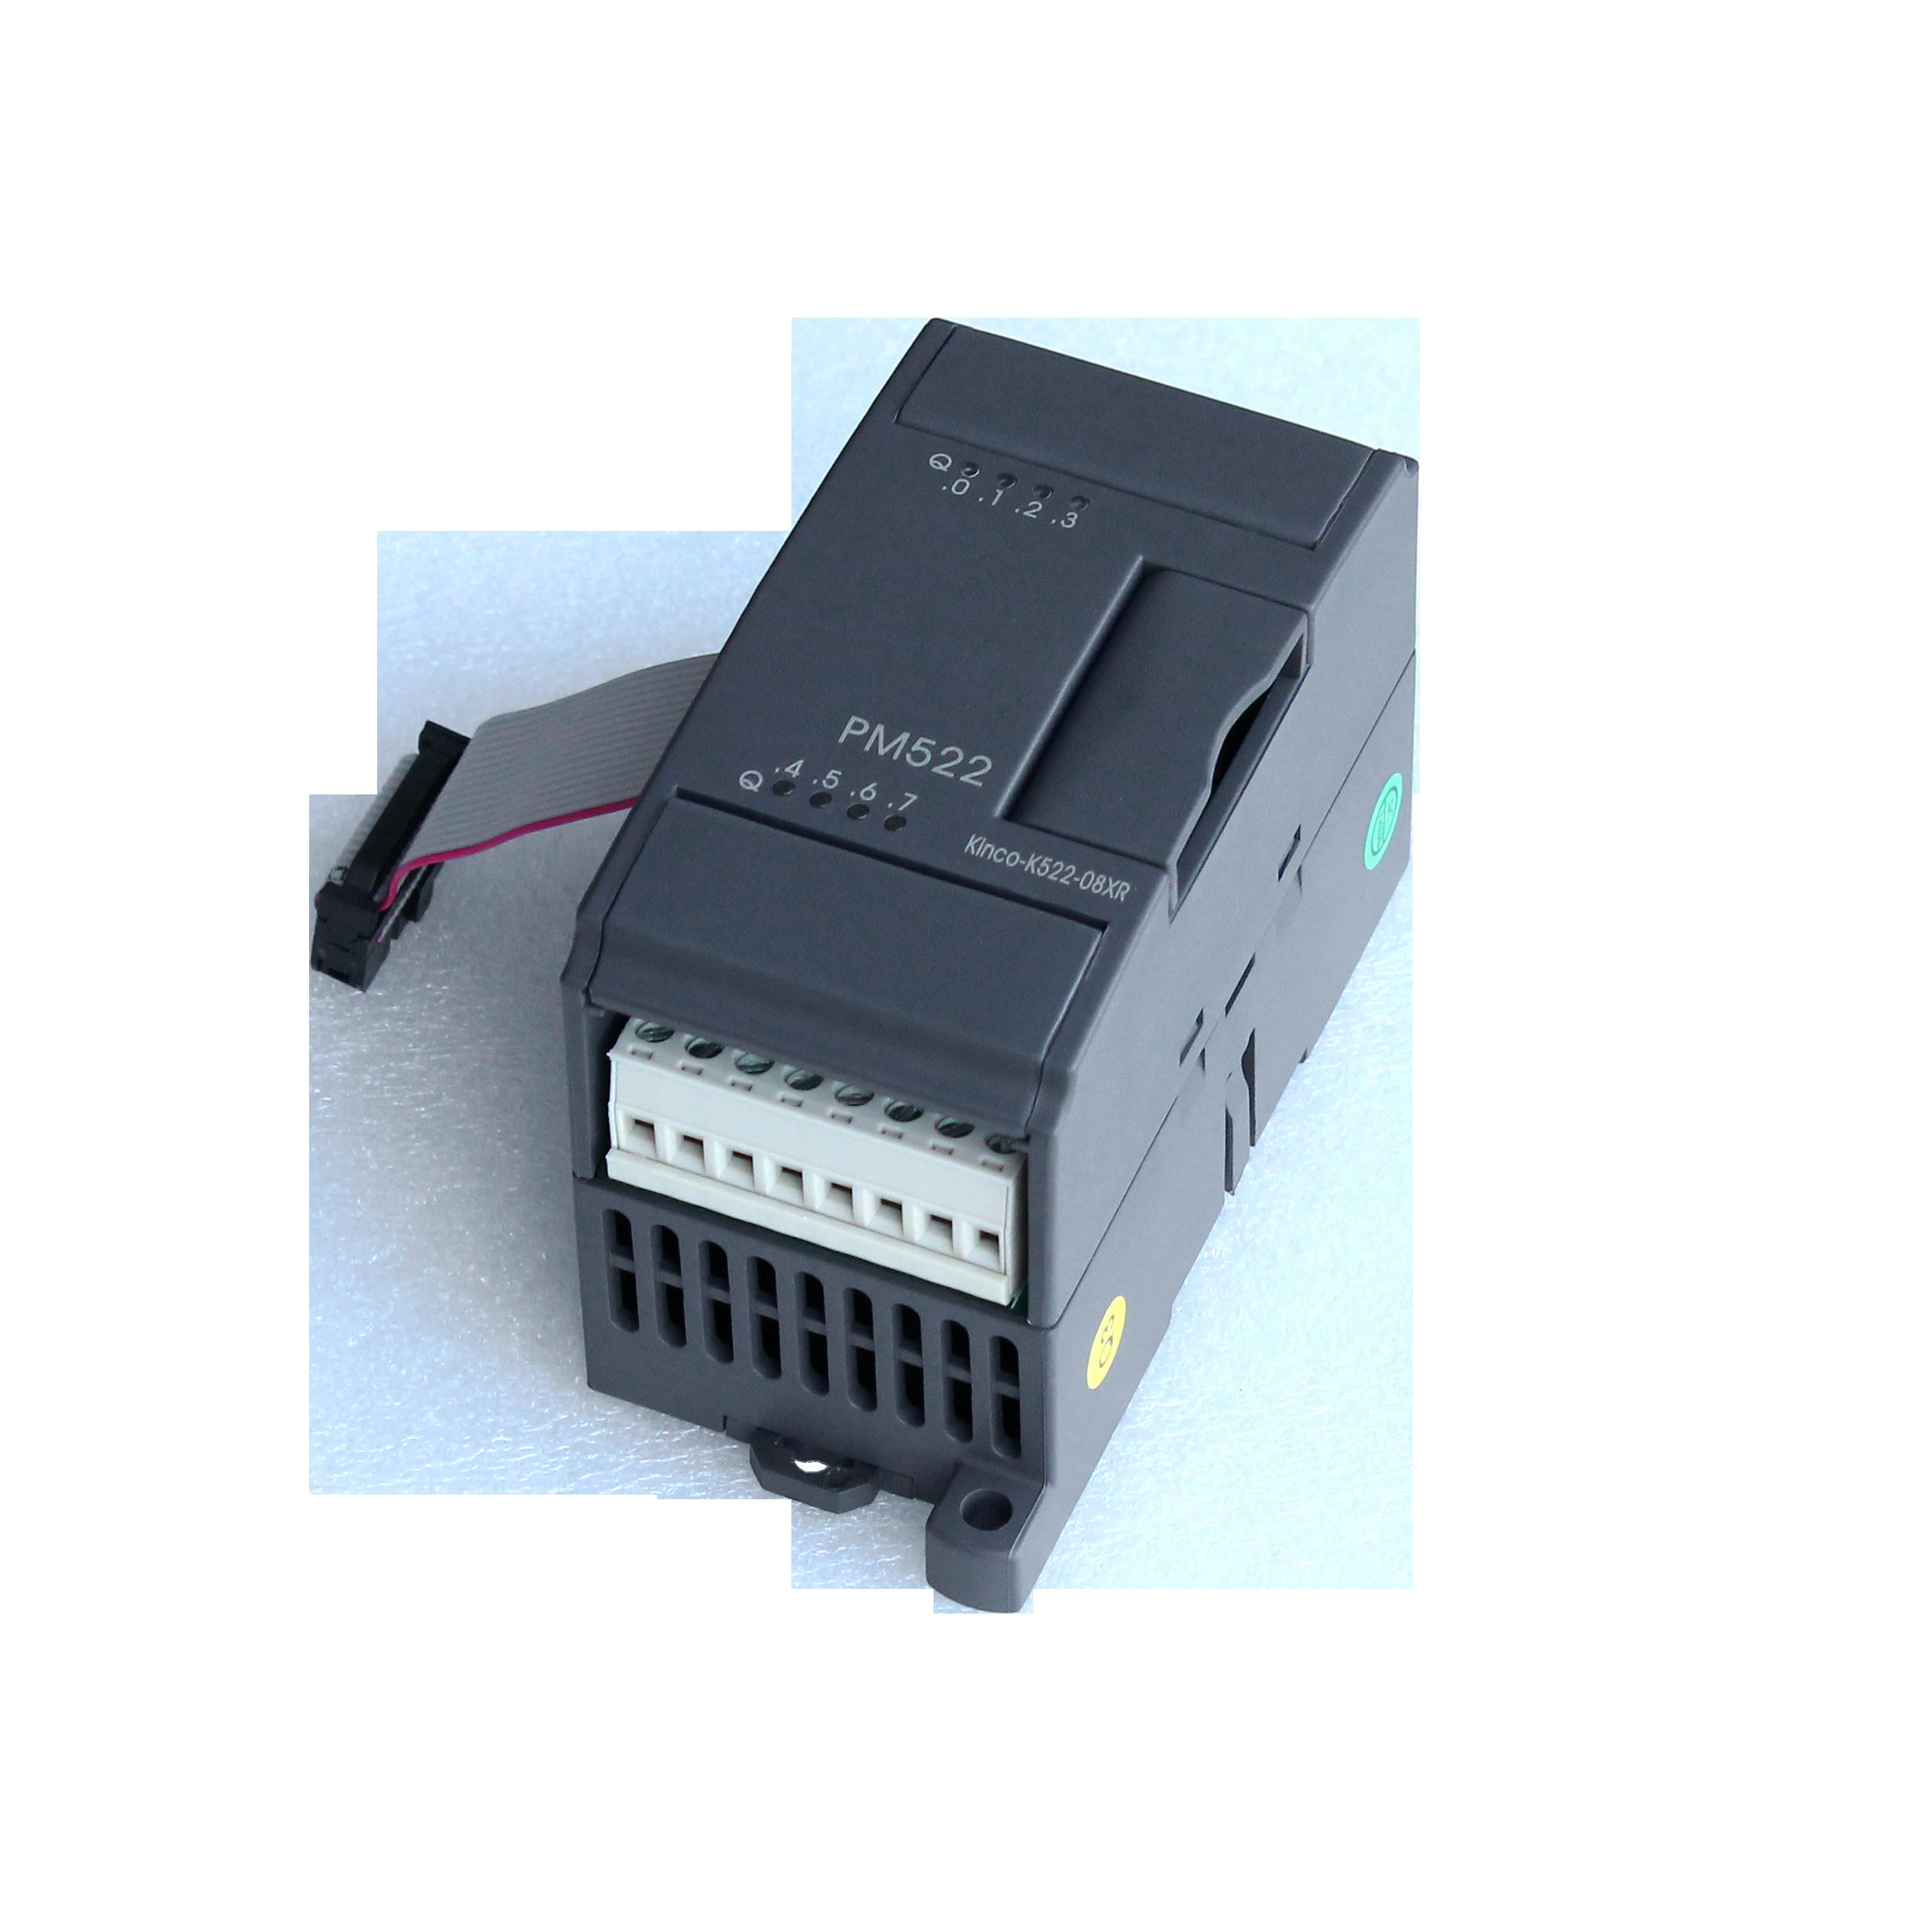 K5_PLC 扩展I/O模块——PM533